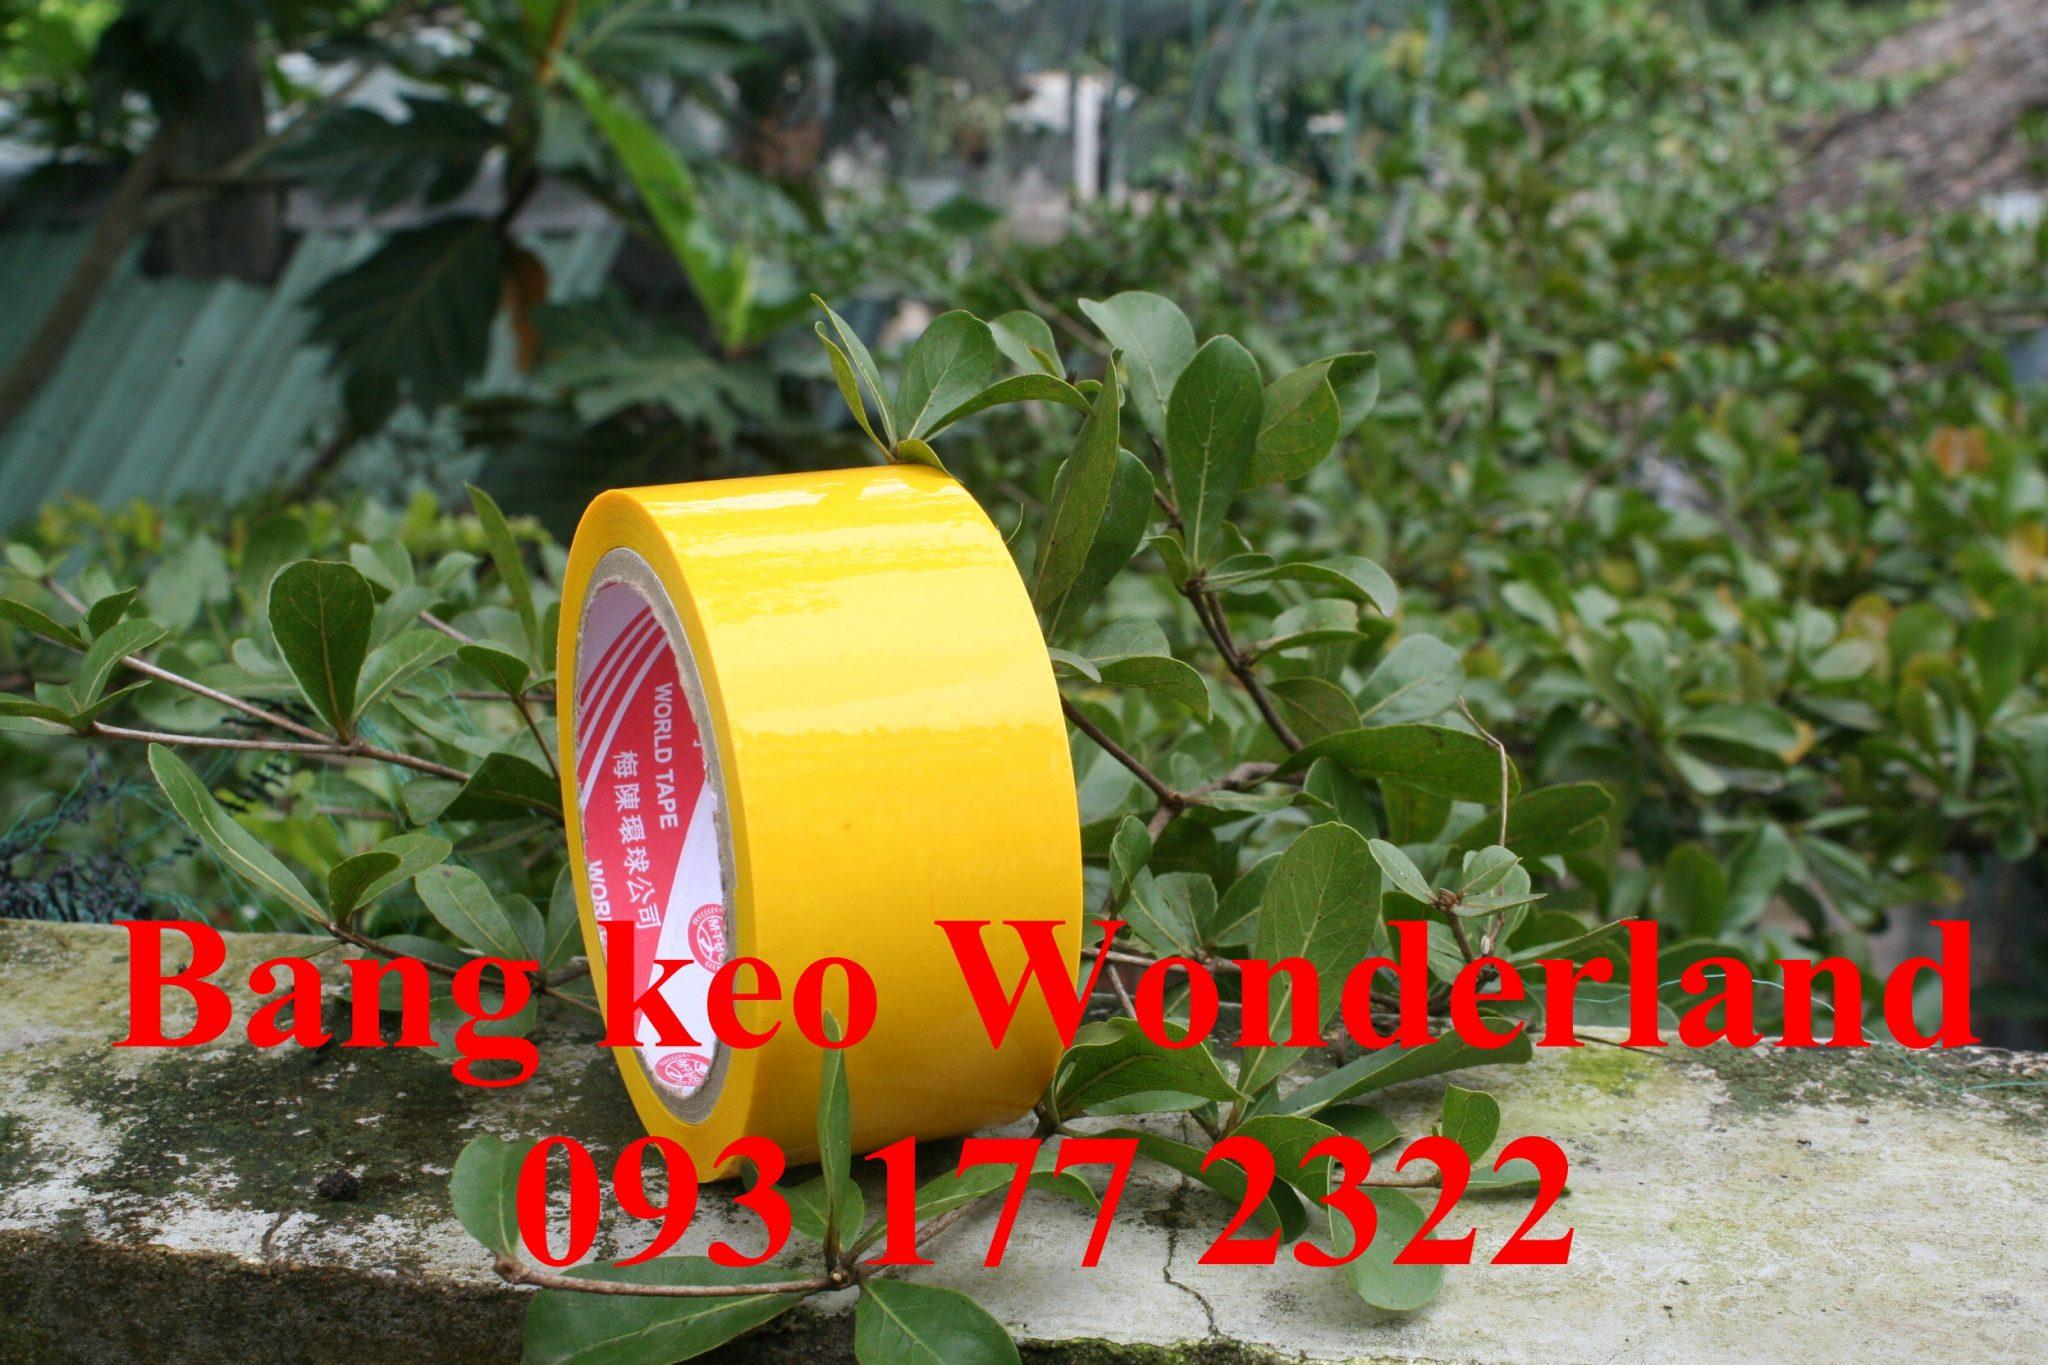 bang-keo-wonderland-02